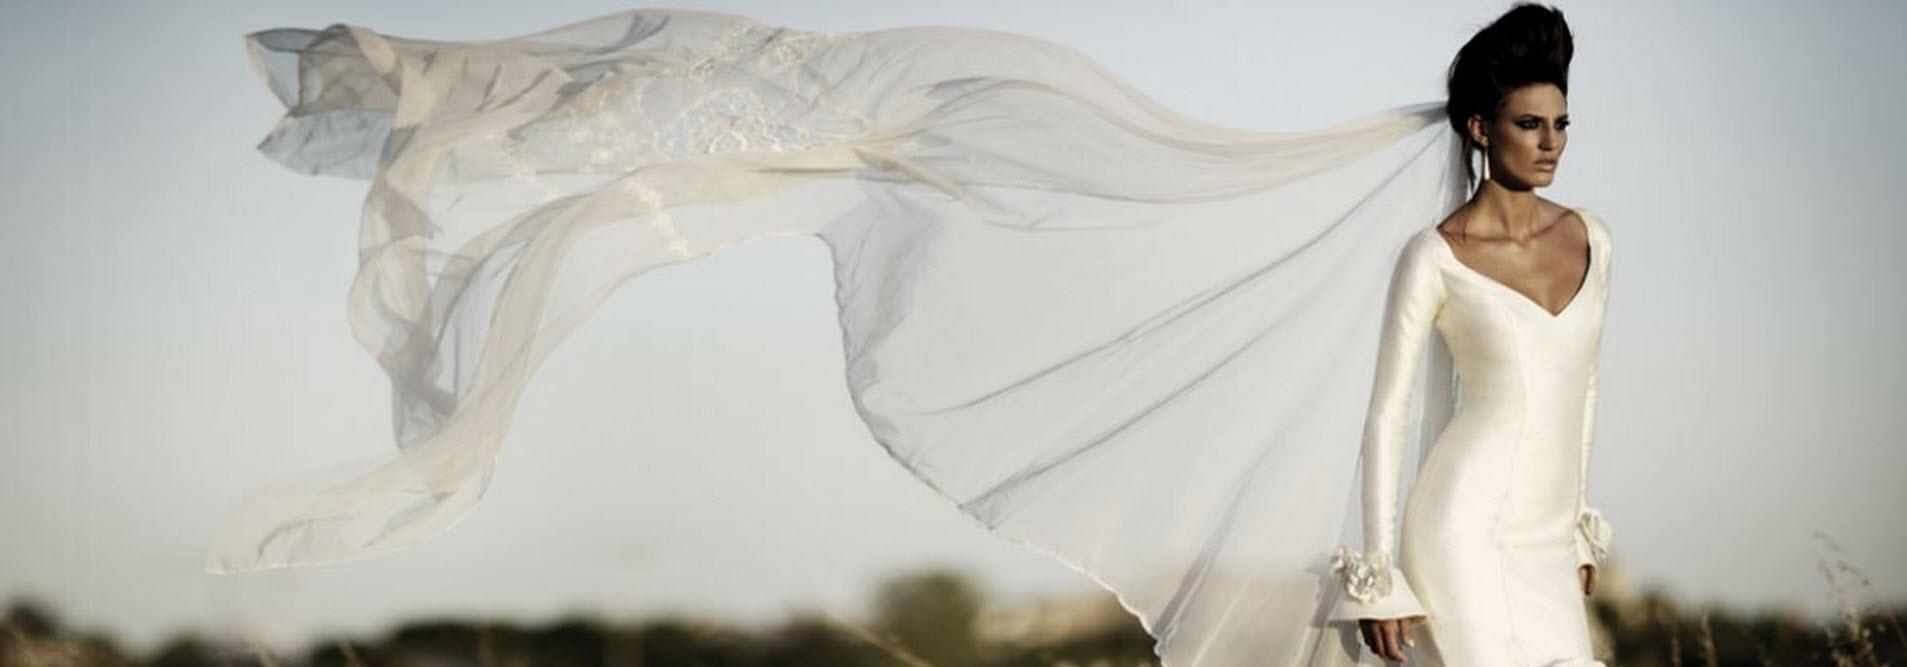 Vestido de Novia en segunda boda | Cuadros